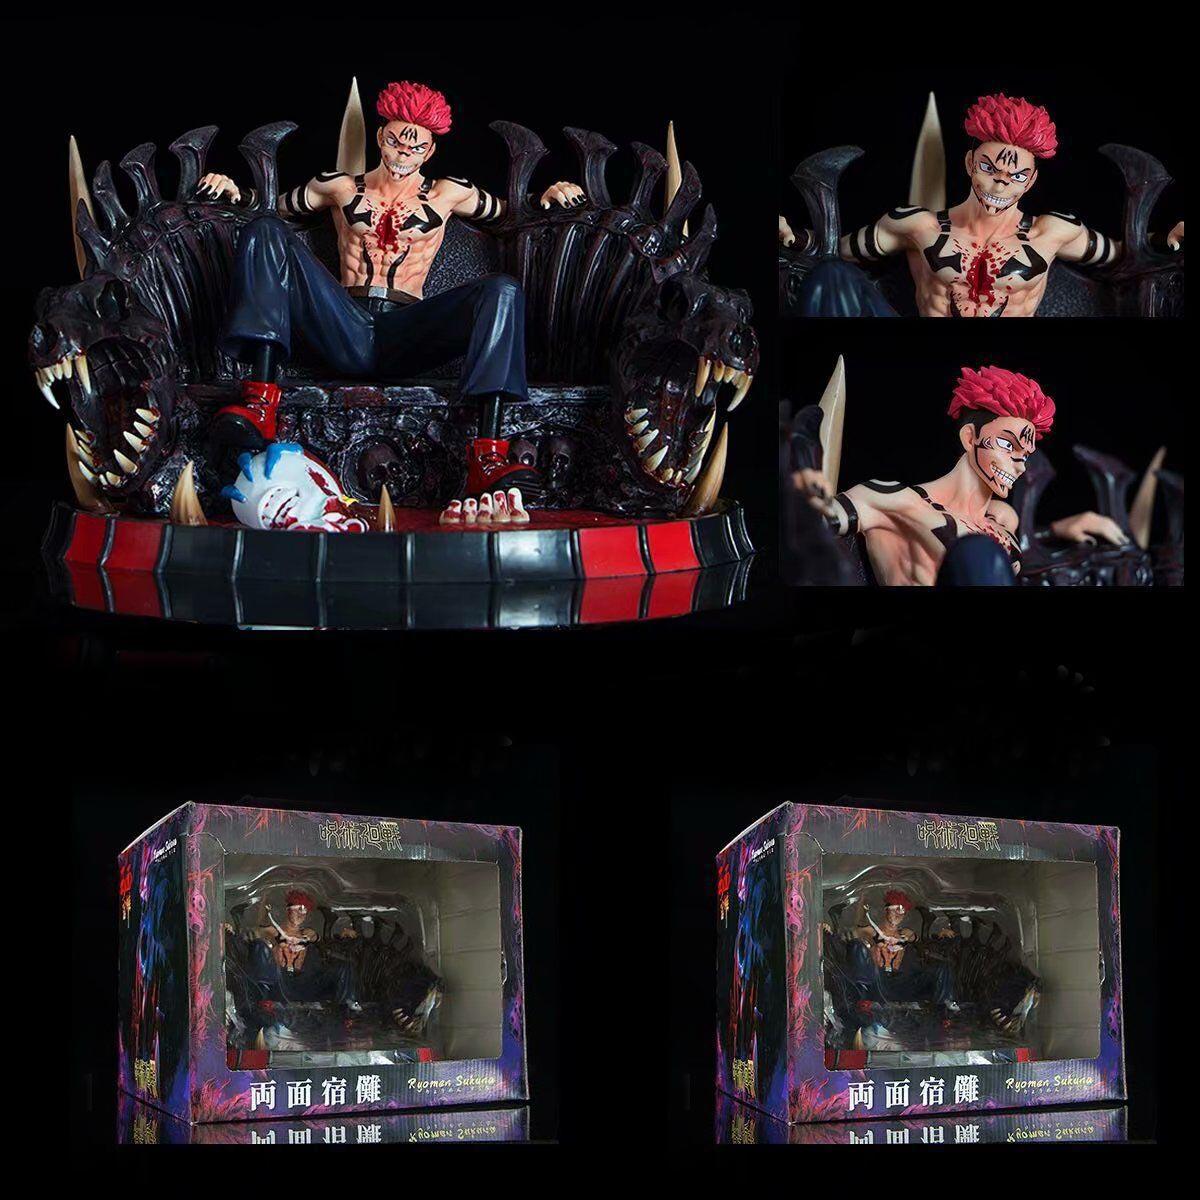 7 anime figure neca pvc jason voorhees friday ultimate horror deluxe edition action figure model toys for collection gift Anime Japanese Jujutsu Kaisen GK Itadori Yuji PVC Action Figure 20CM Anime Figure Statue Model Toys Collection Doll Gift